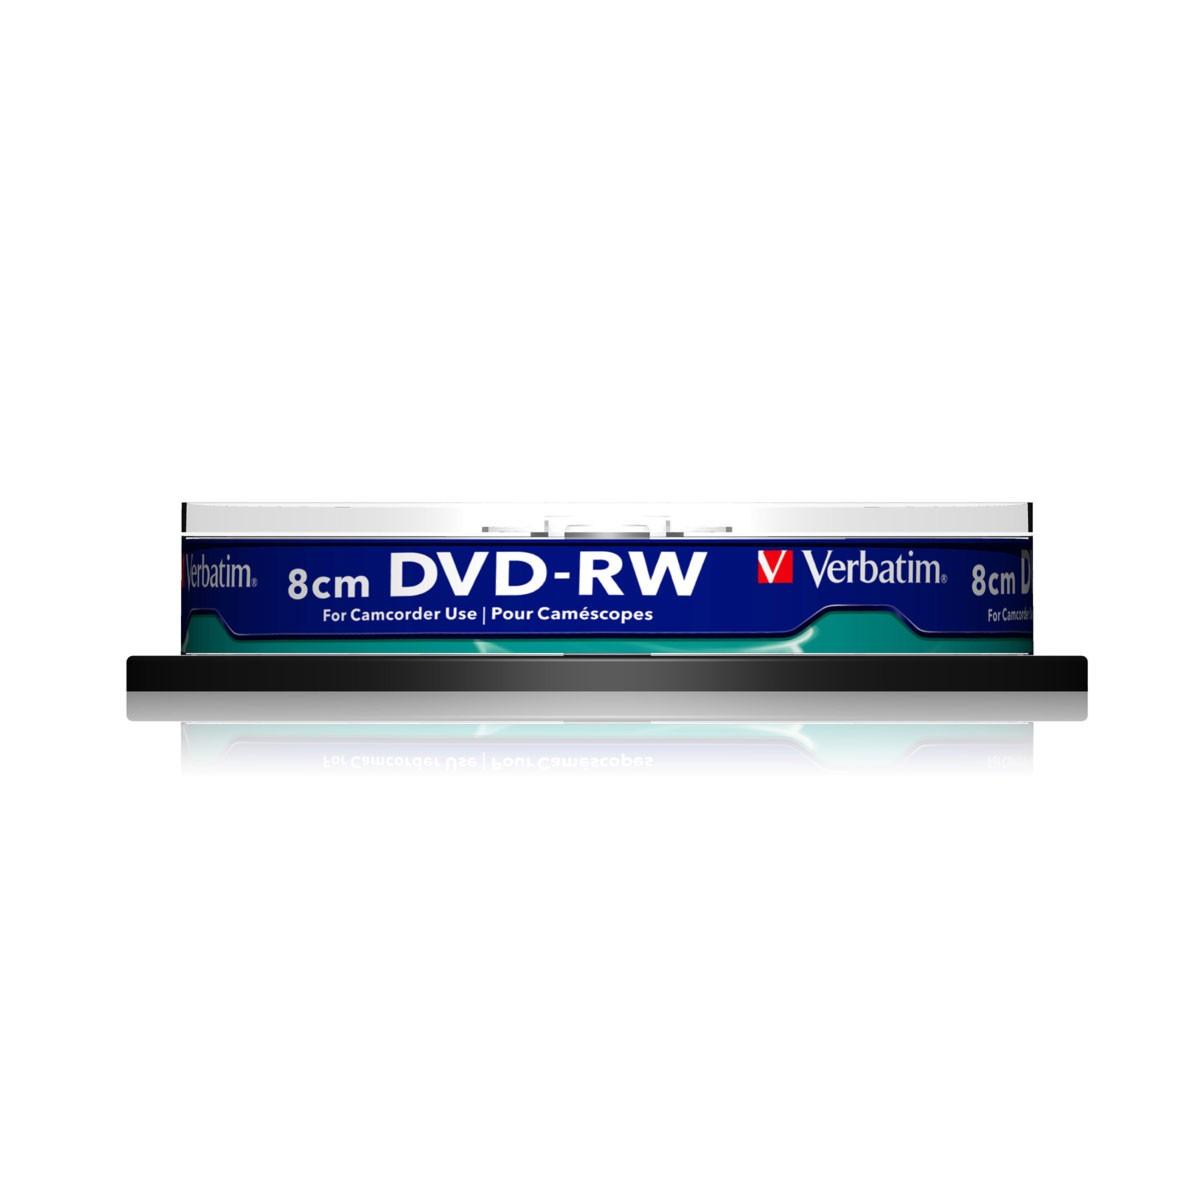 verbatim mini dvd rw 2x: